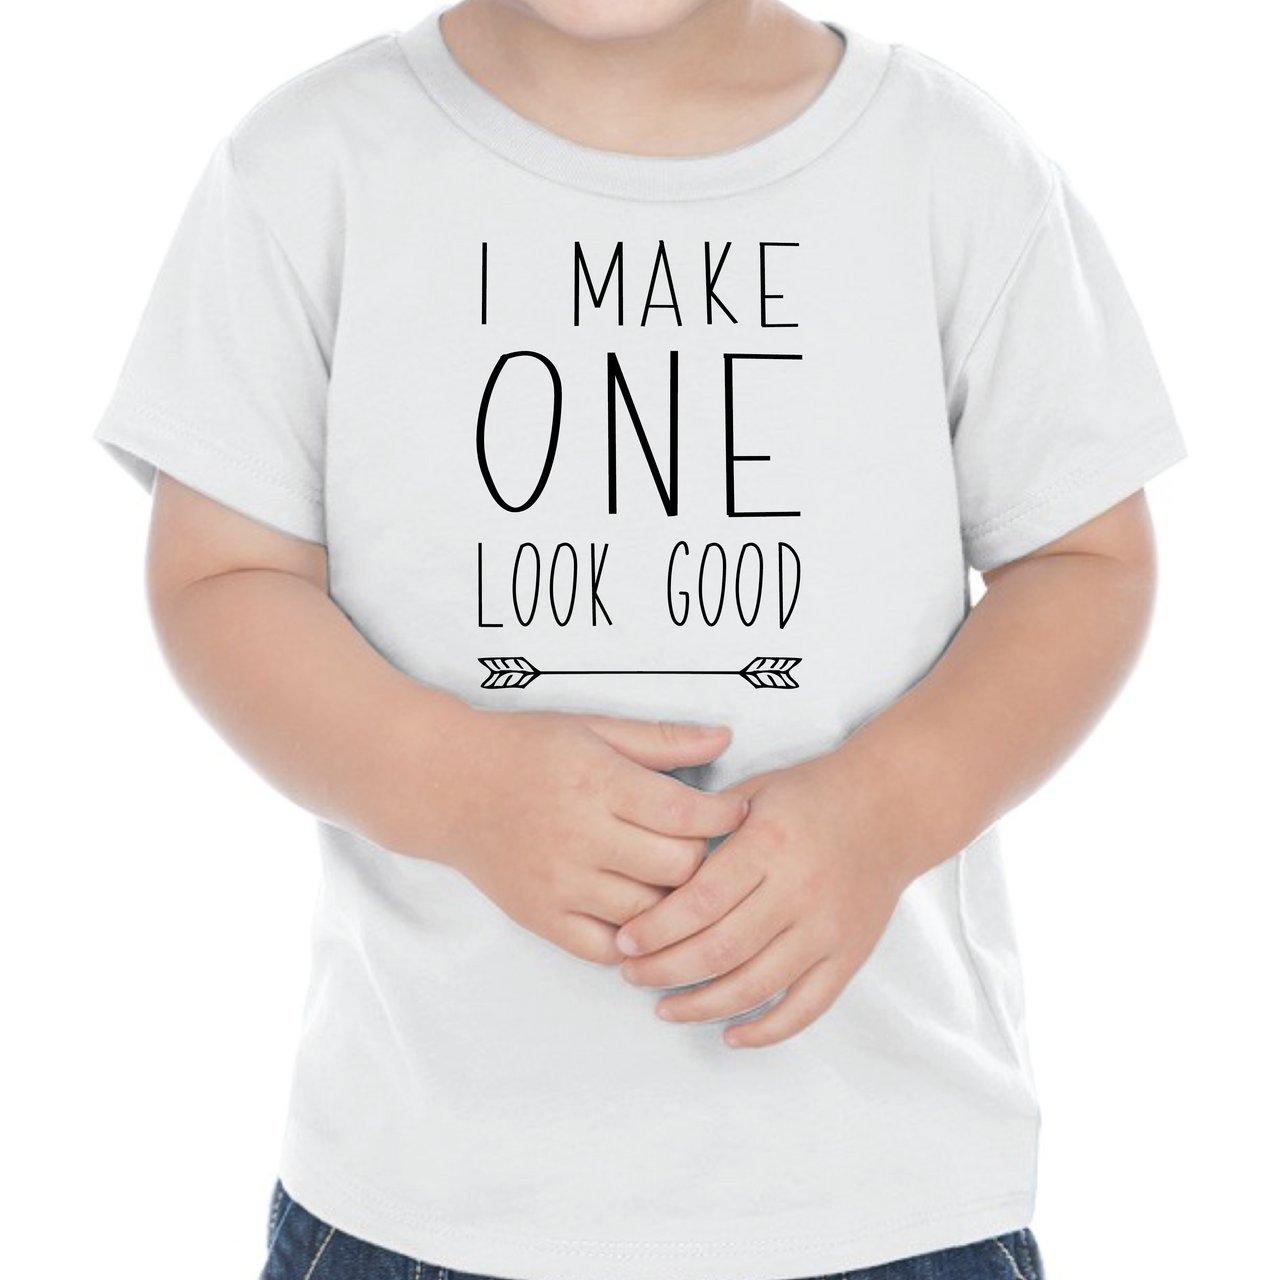 First Birthday Outfit Boy One Year Old Boy Birthday T-Shirt